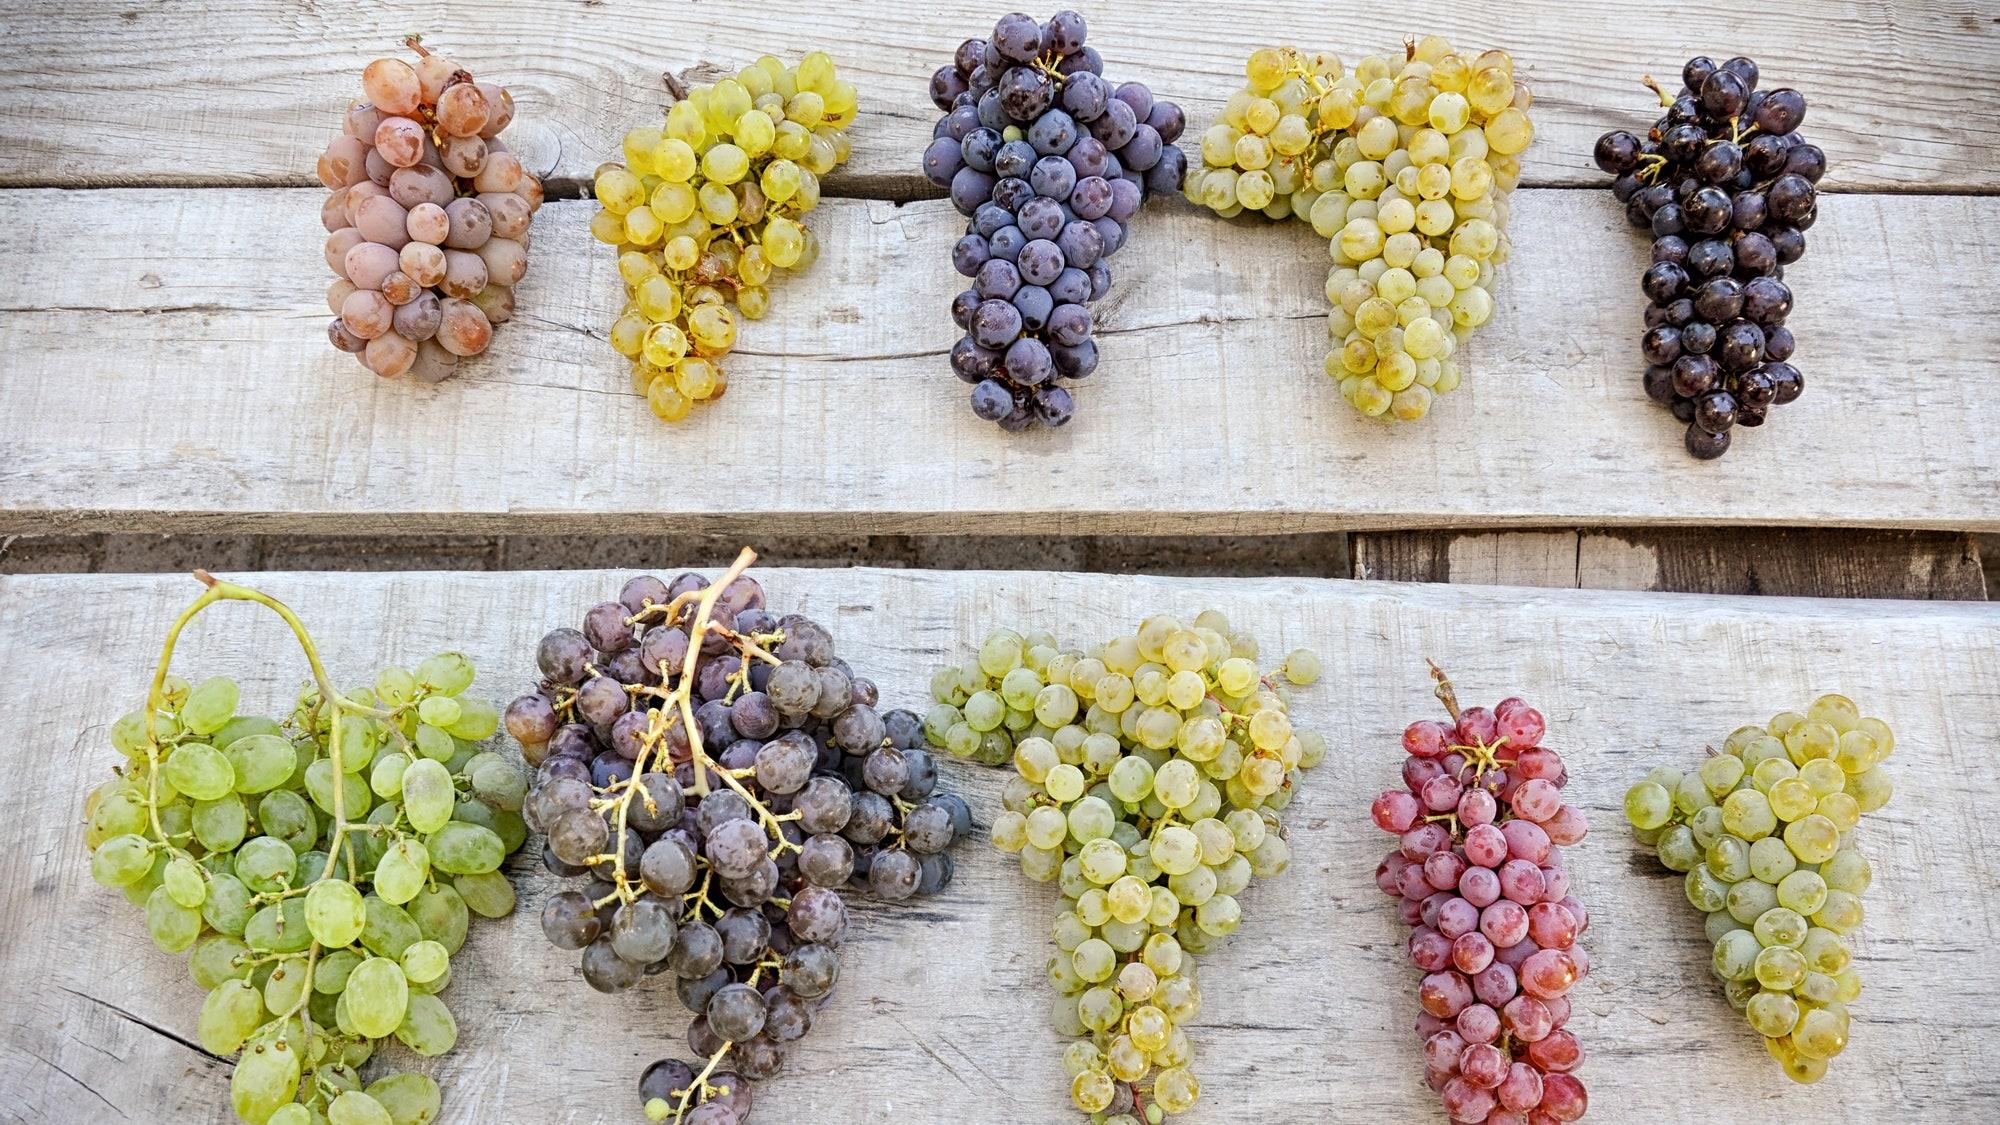 grapes_22092016_1.jpg